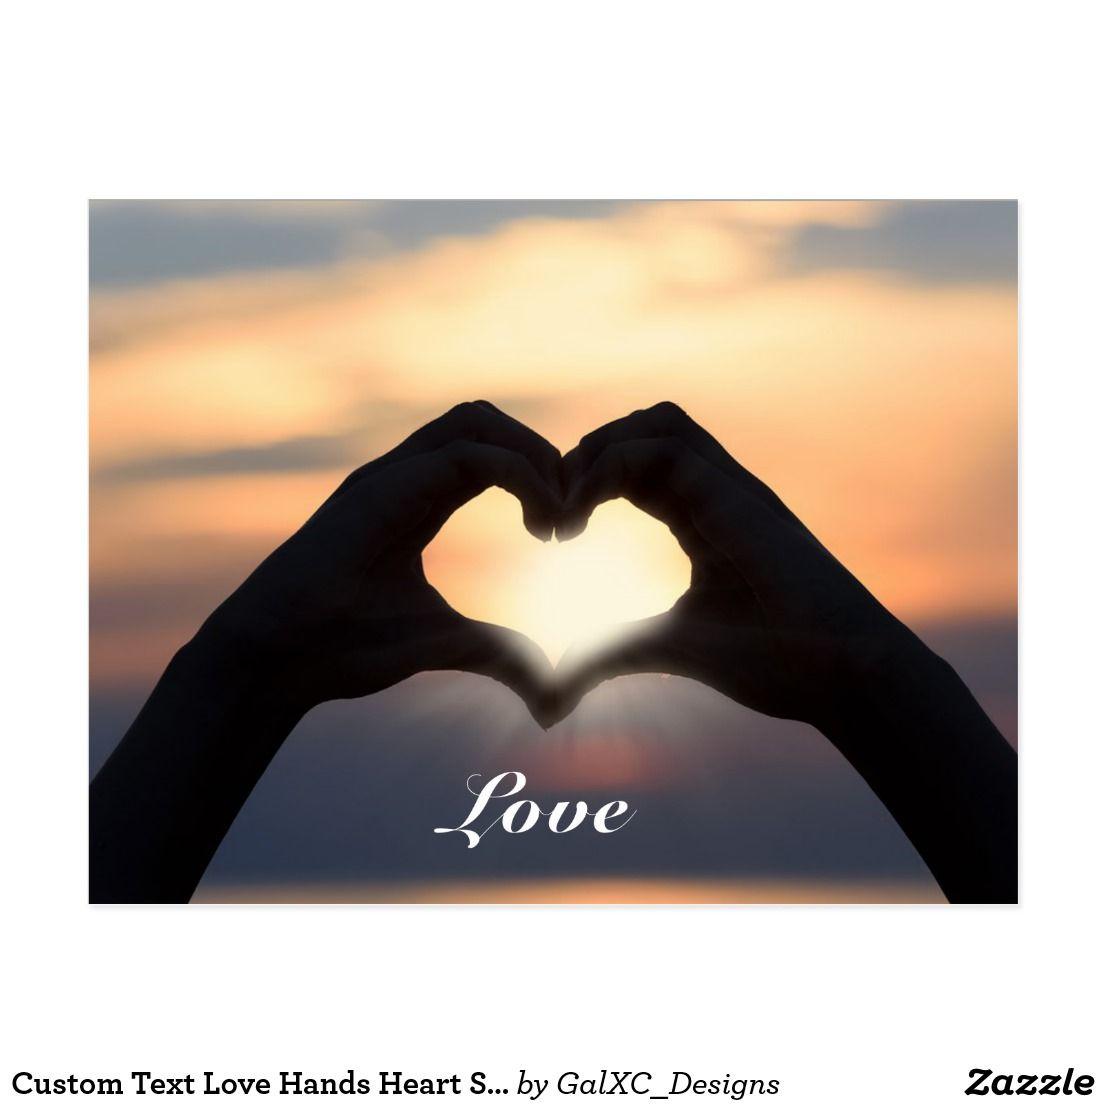 Custom Text Love Hands Heart Shape Twilight Sunset Postcard Zazzle Com In 2021 Peace Photography Inspiration God Photography Love Hands Hand shaped love wallpaper in sunset